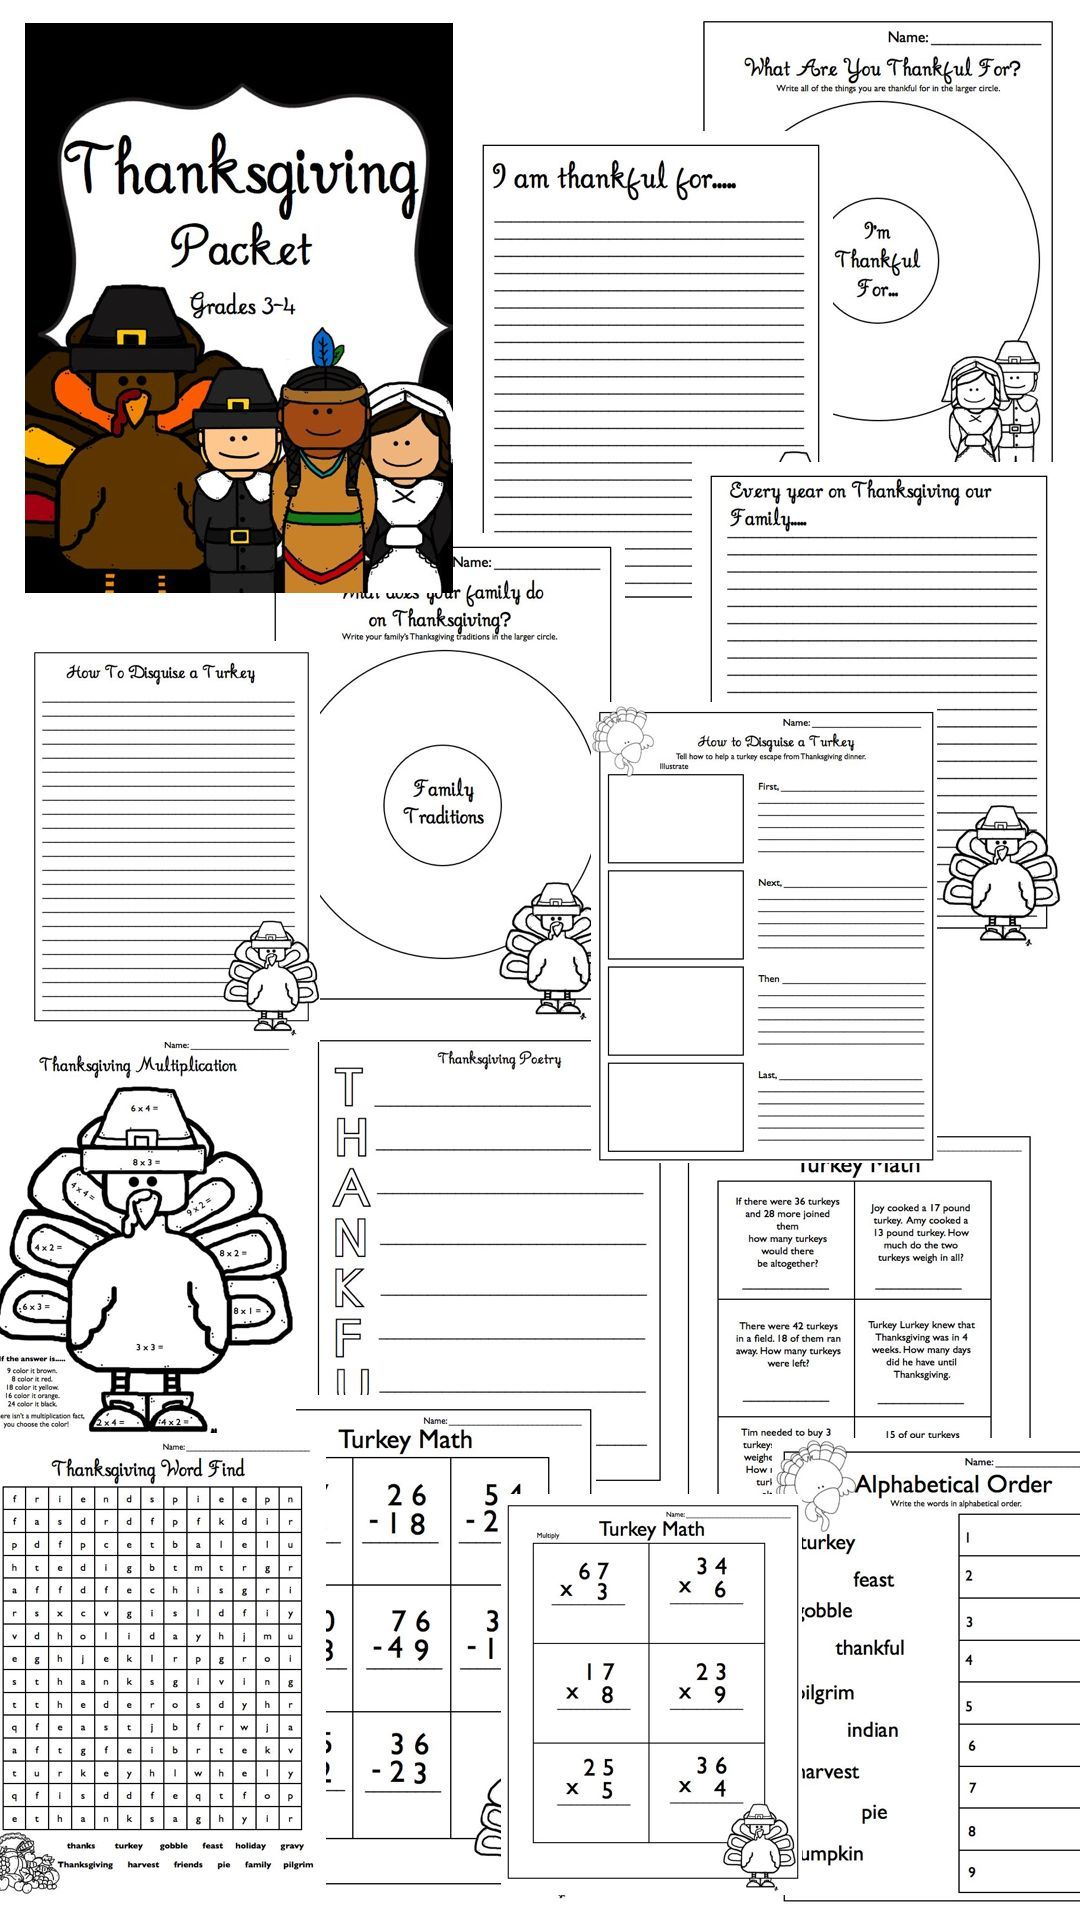 small resolution of Thanksgiving Packet Grades 3-4 ELA \u0026 Math   Thanksgiving classroom  activities